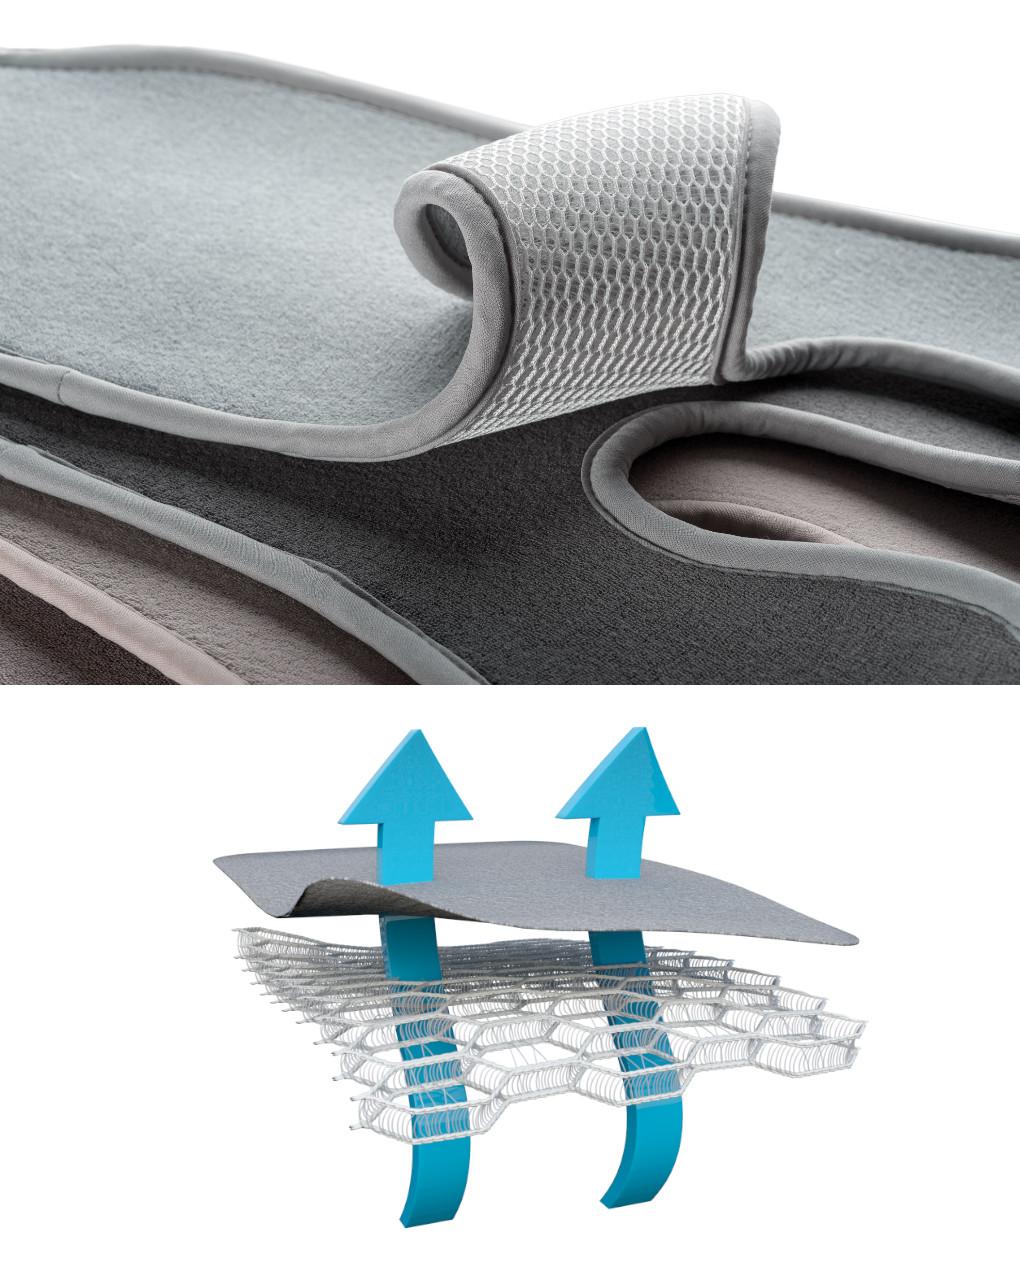 Cool seat foderina gruppo 2/3 aircuddle grigia - AirCuddle